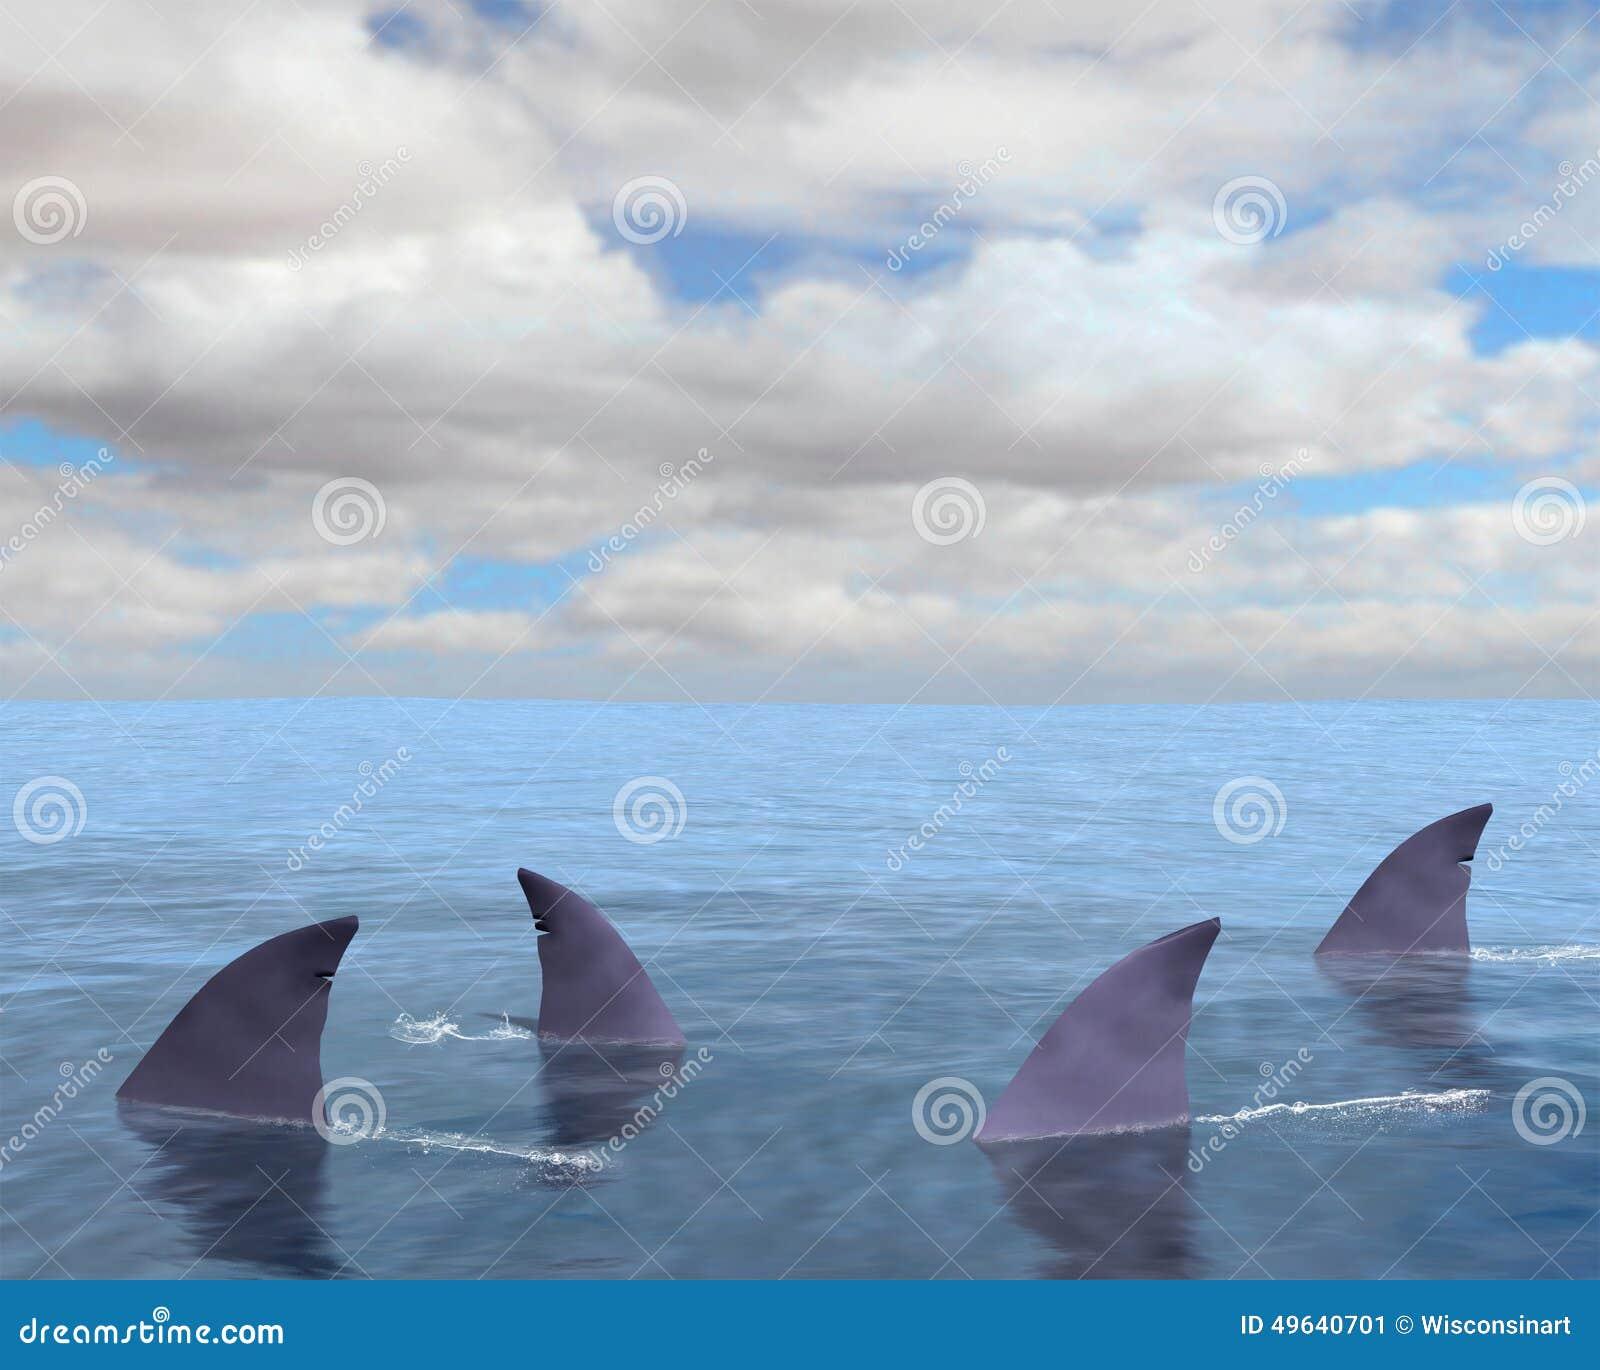 2560x1600 ocean sharks - photo #39